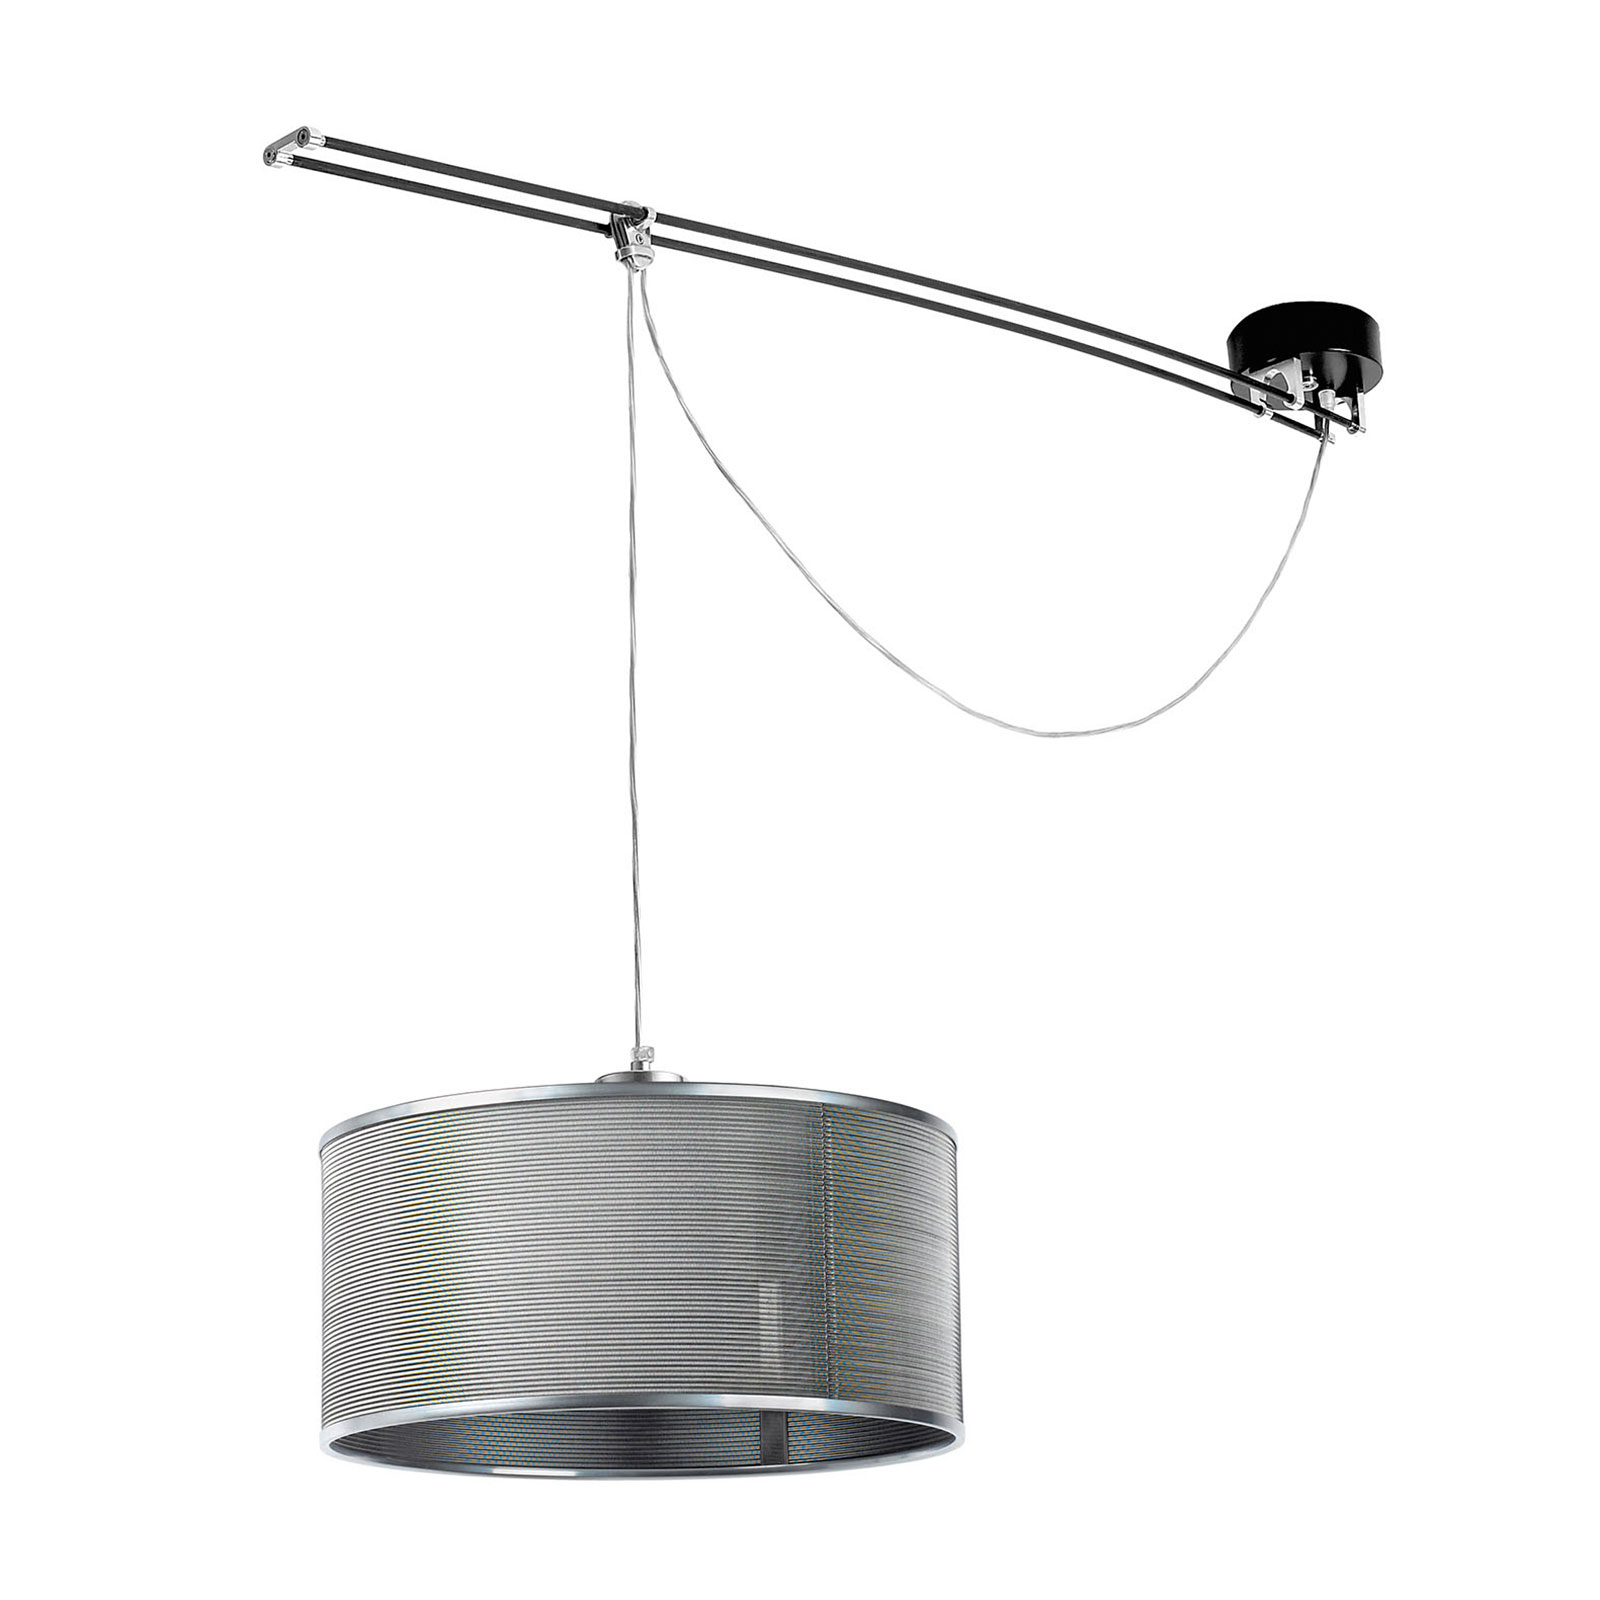 Lumina Moove lampada a sospensione 1 luce, grigio